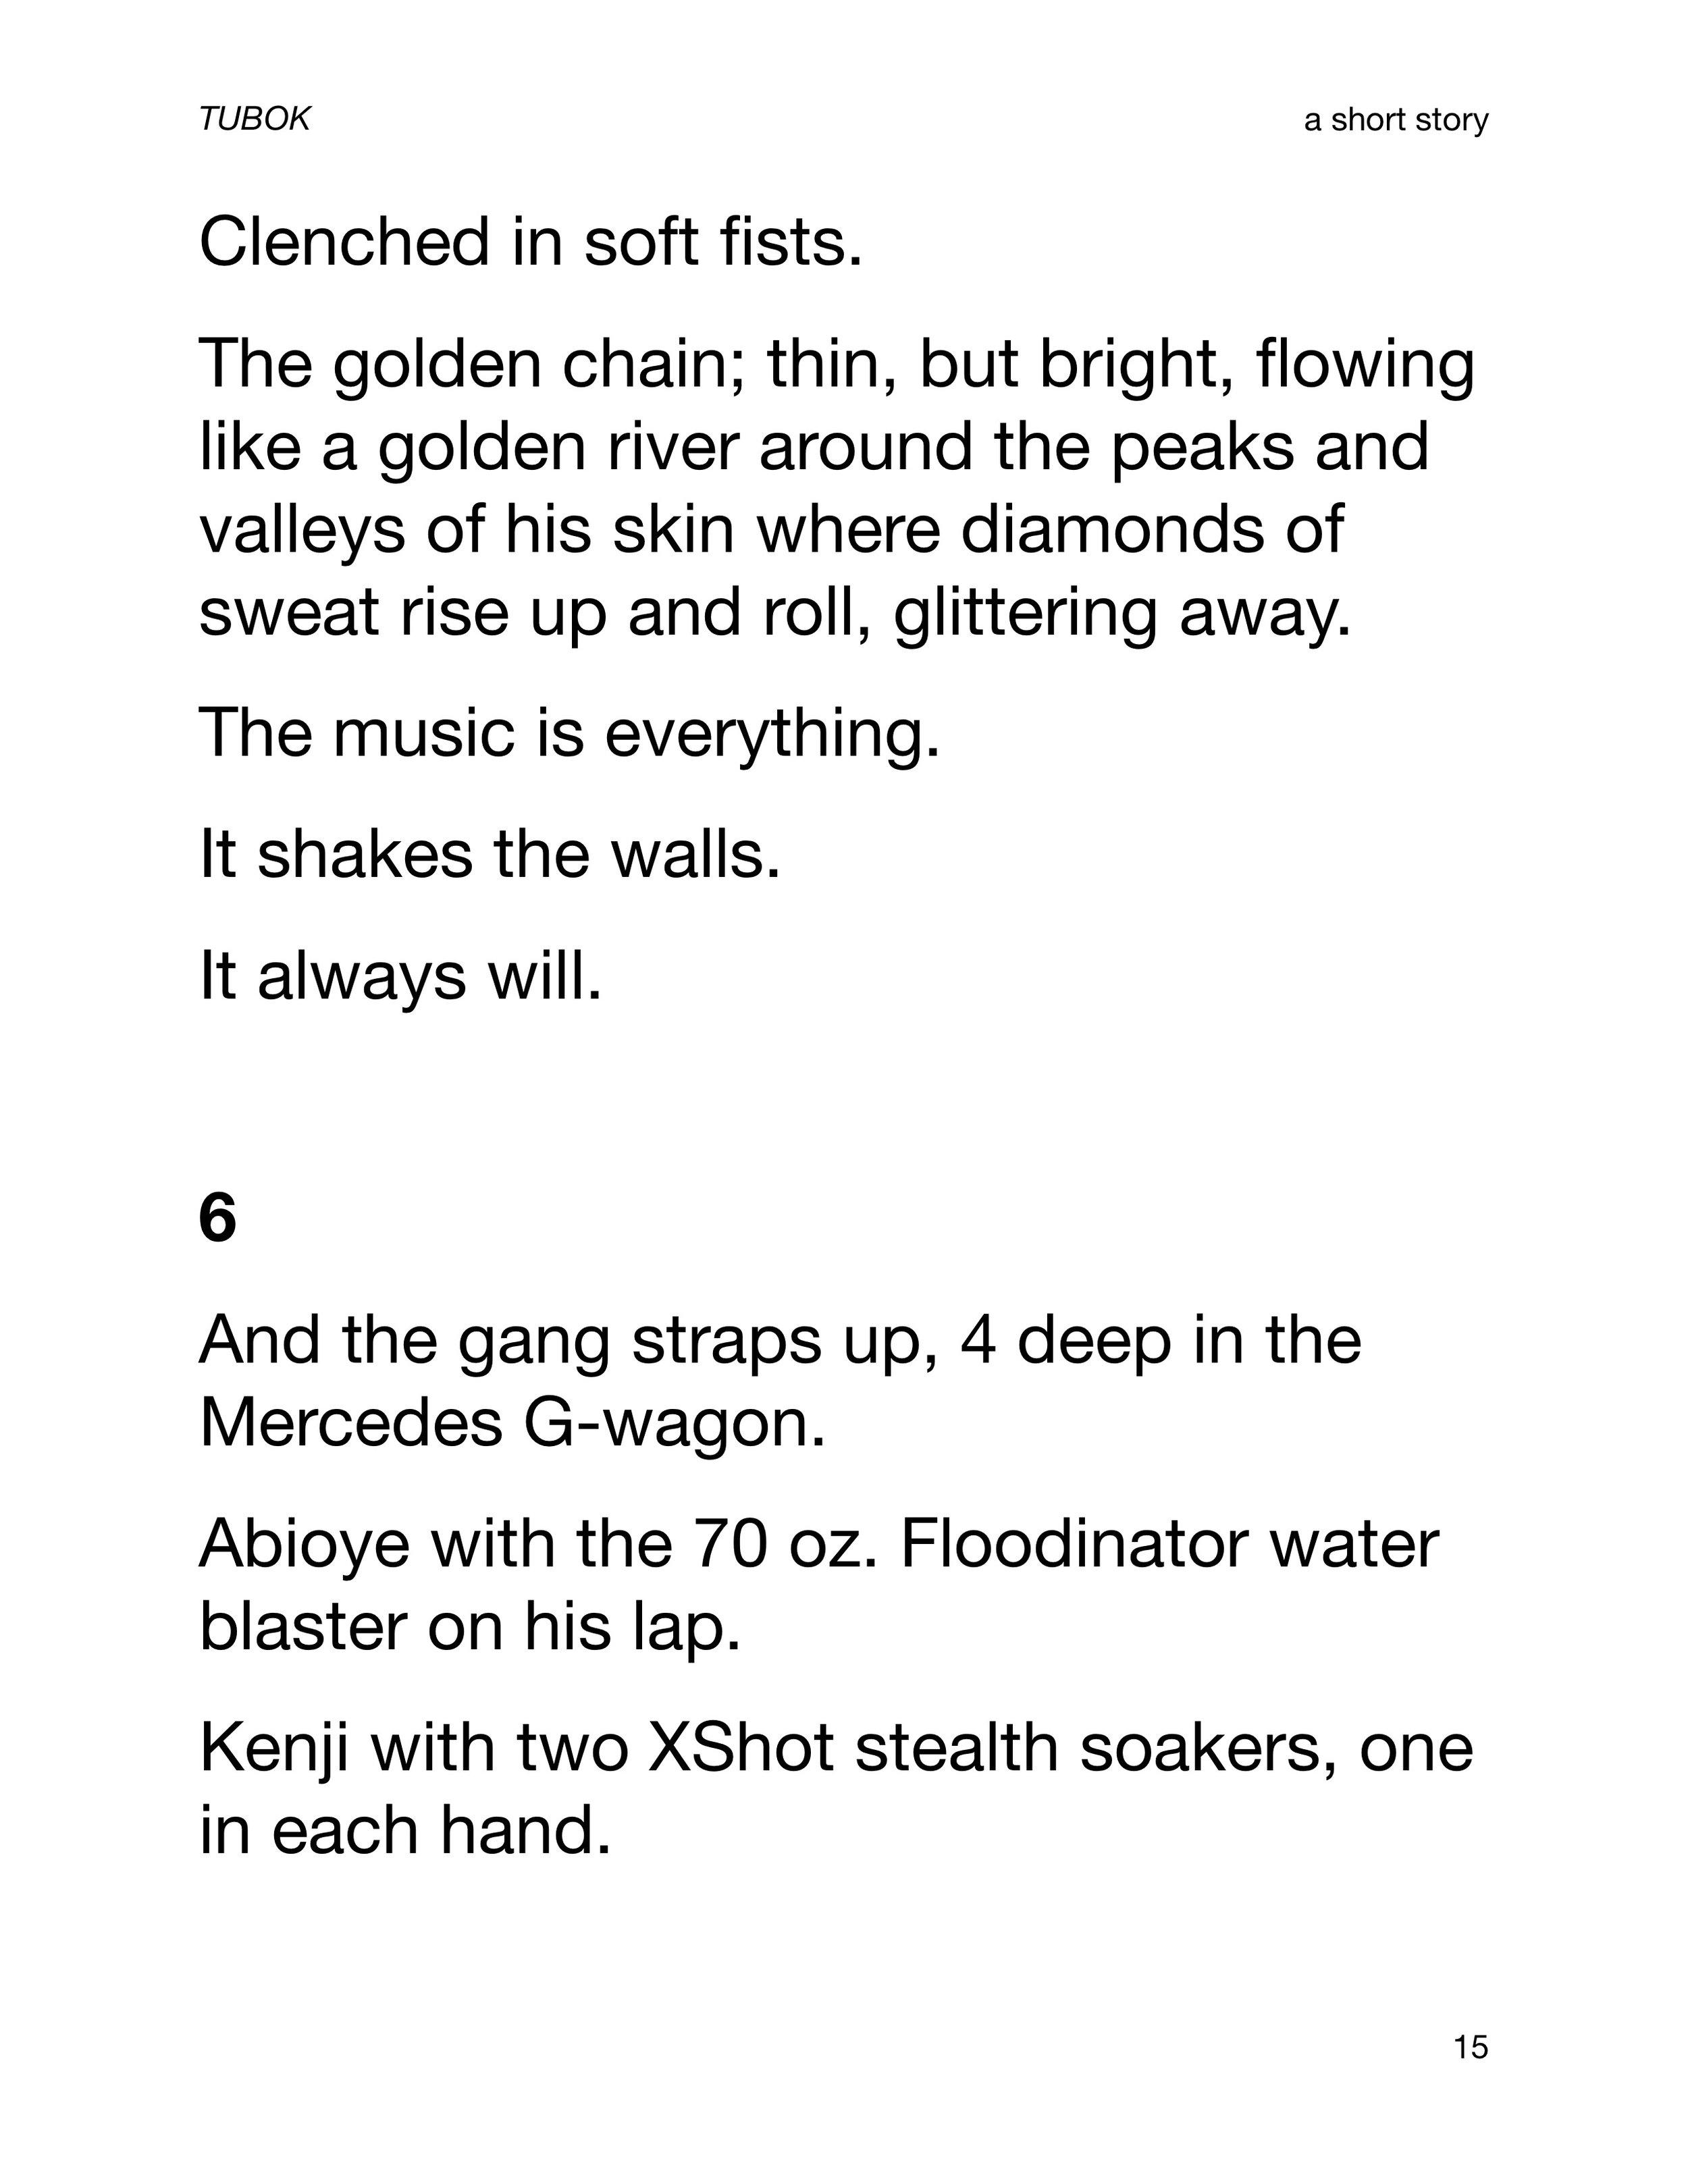 TUBOK (A Short Story) 15.jpg